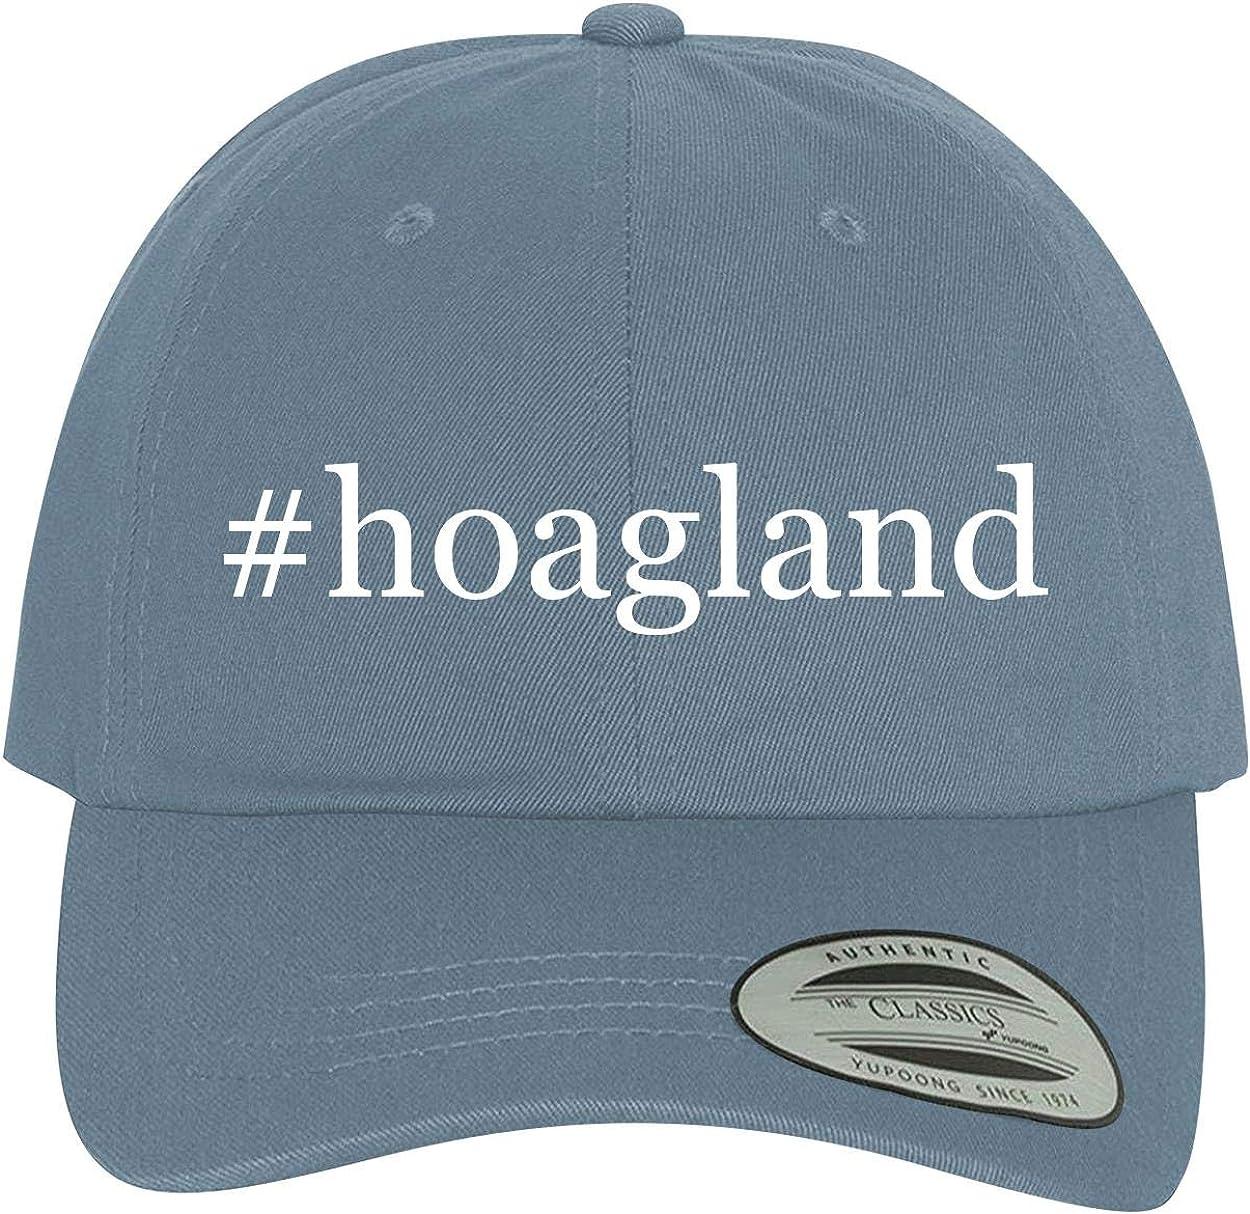 BH Cool Designs #Hoagland Comfortable Dad Hat Baseball Cap